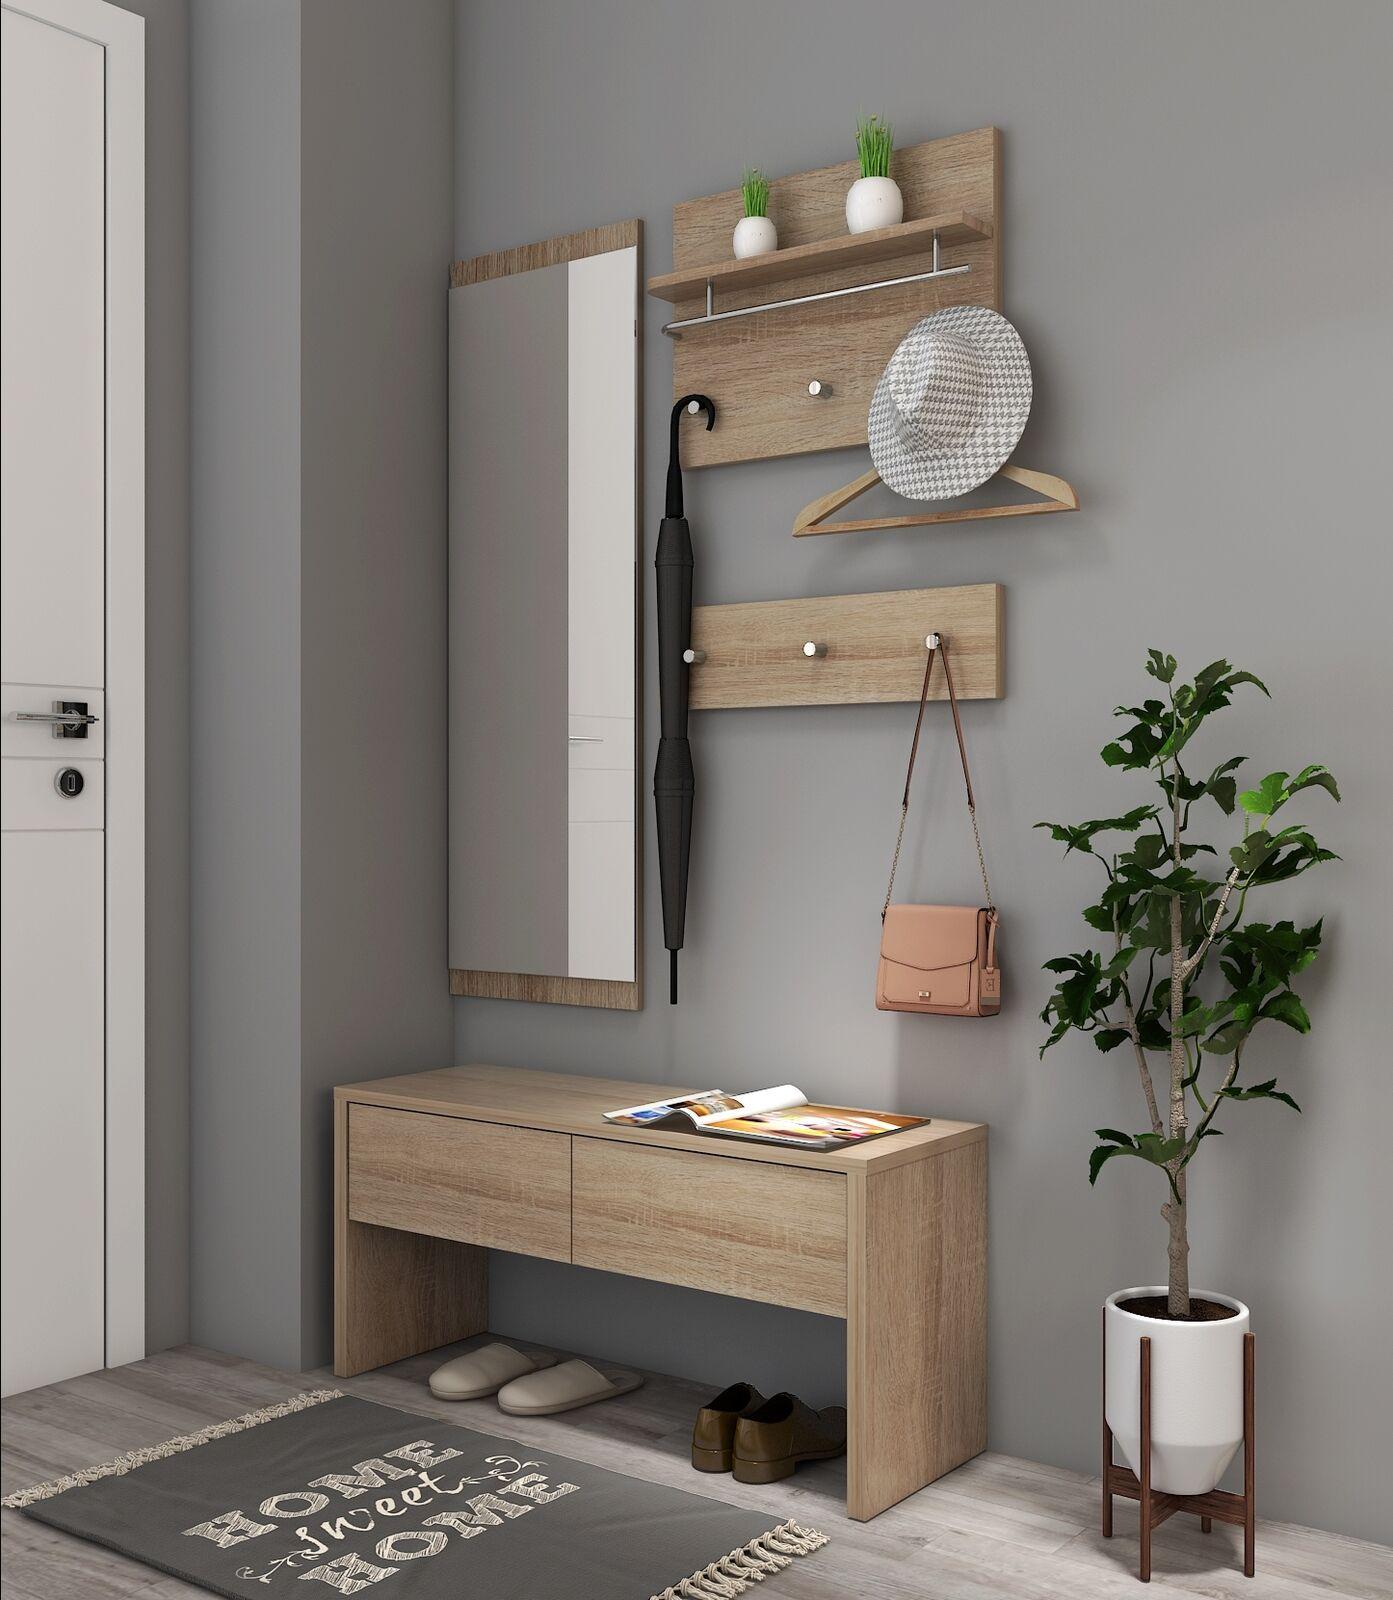 4 teilig garderobe set flurgarderobe spiegel wandgarderobe. Black Bedroom Furniture Sets. Home Design Ideas